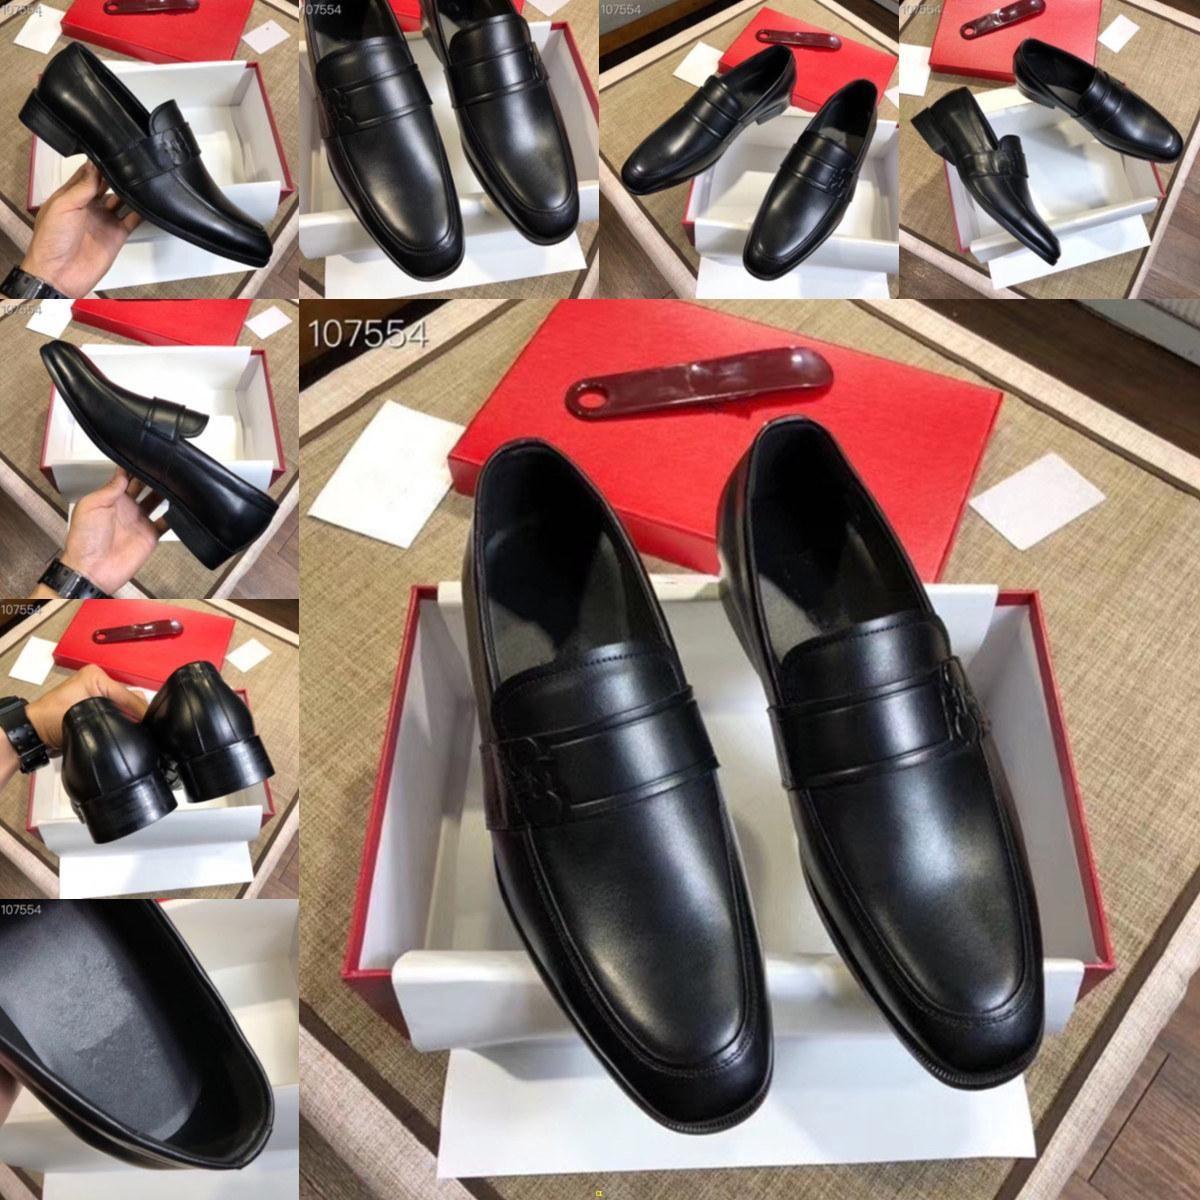 Q4 럭셔리 남성 신발 공식적인 결혼식 남자 신발 클래식 로퍼 남자 가죽 드레스 신발 PRIA Chaussures Classique Homme 11에 Sepatu Slip